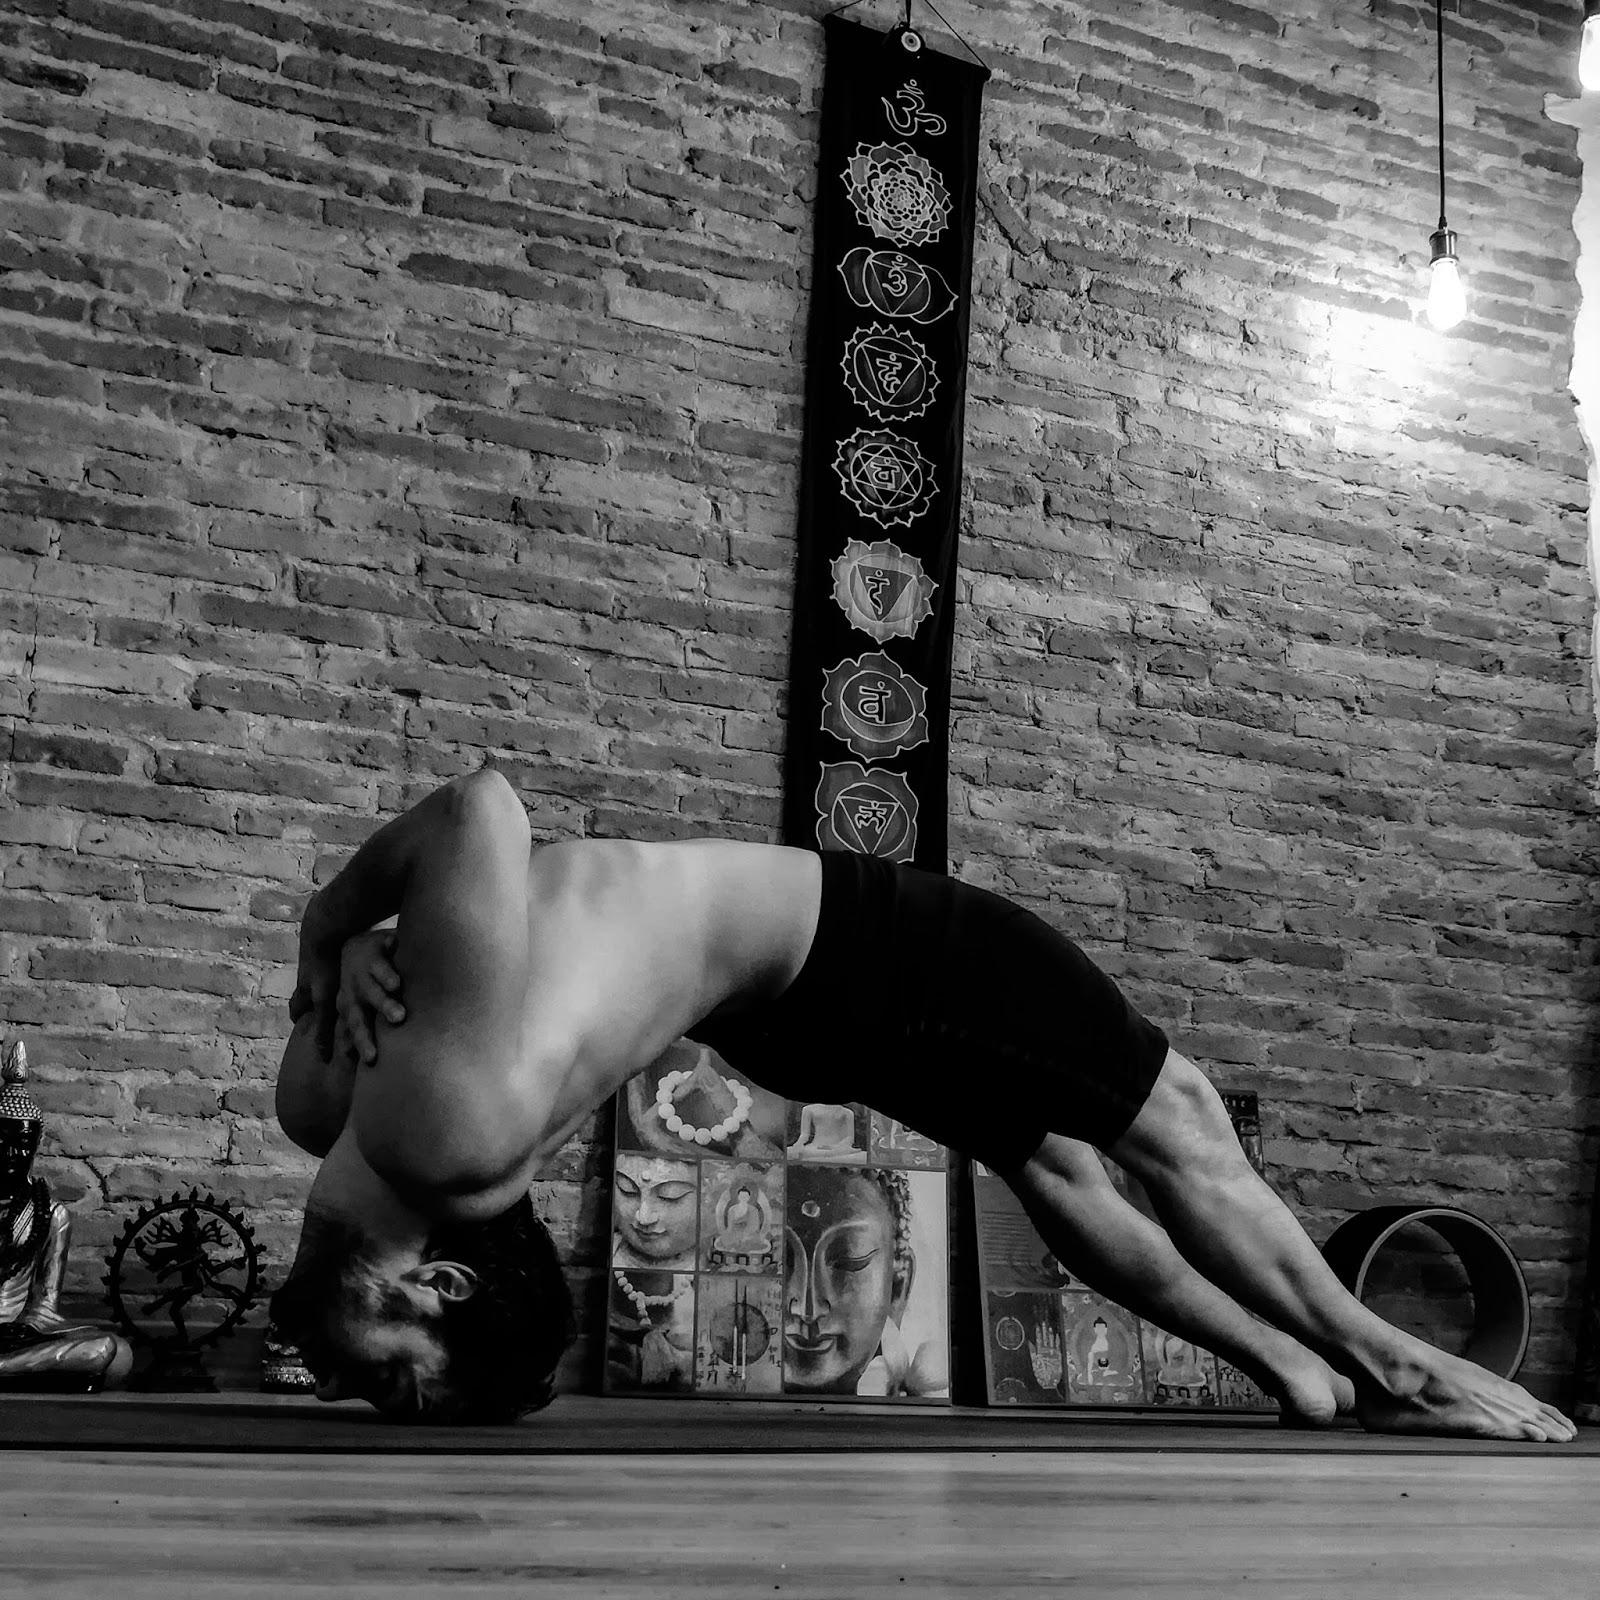 Ashtanga Vinyasa Yoga Tarragona: My practice